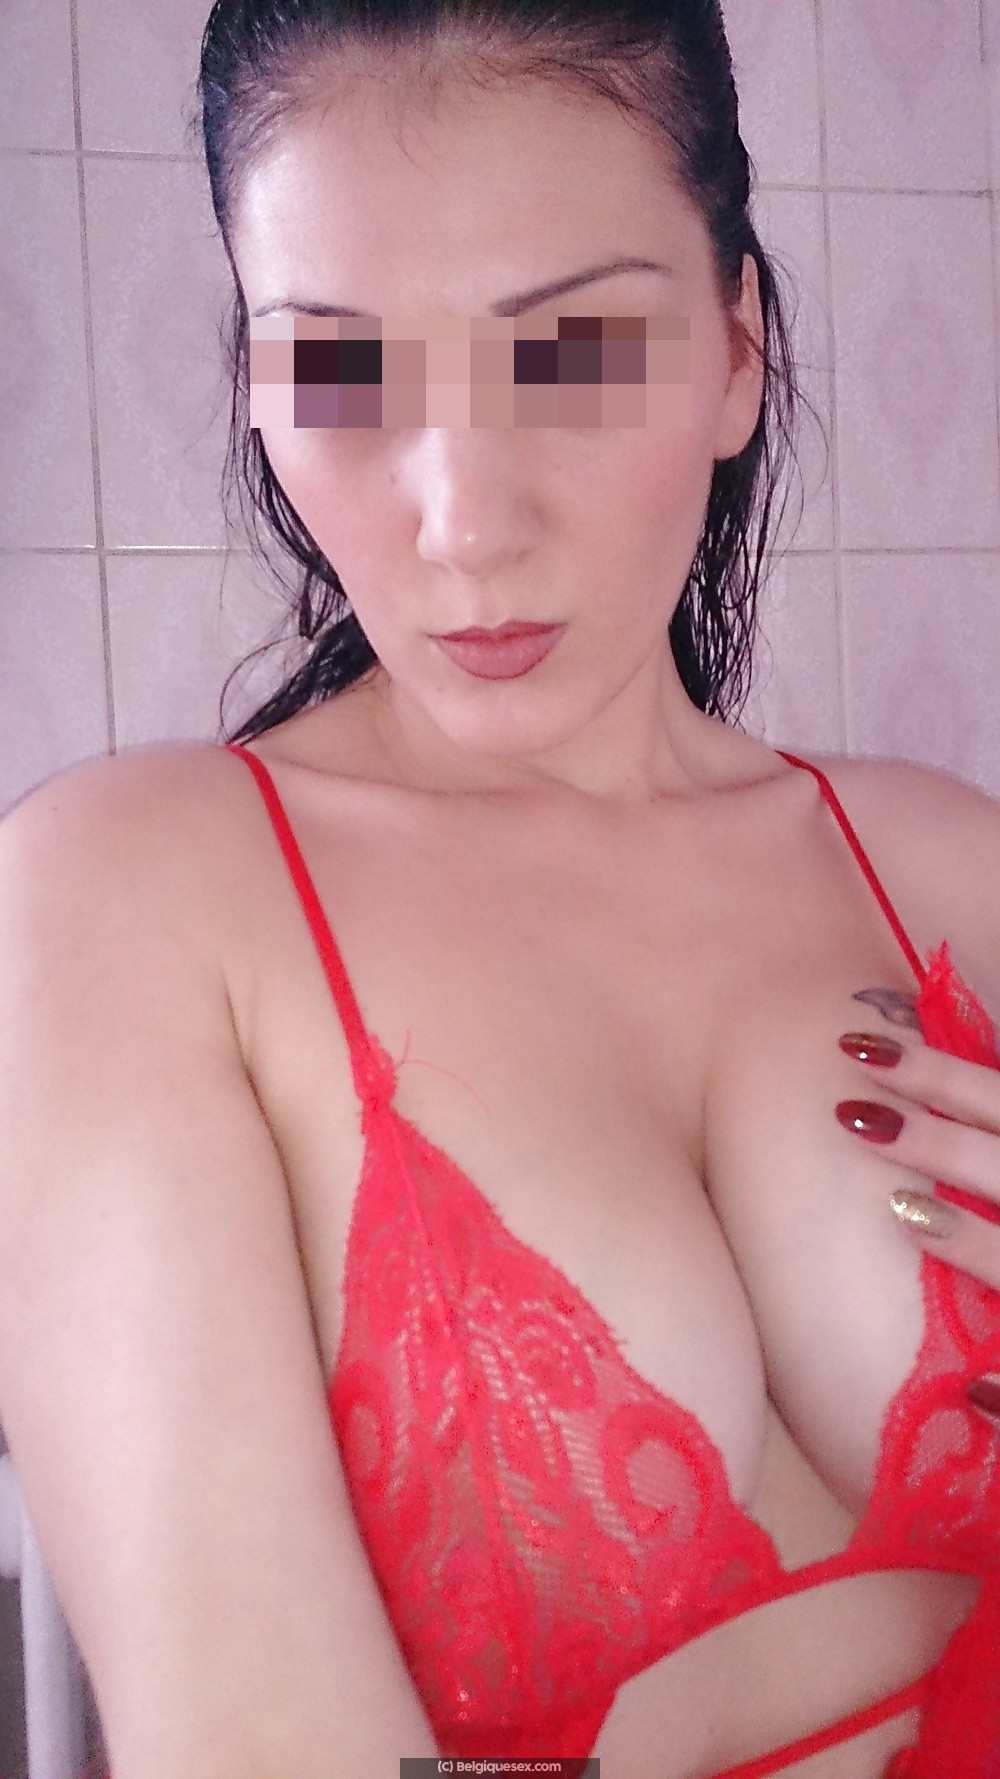 jeune fille sexe video rencontre sexe wannonce